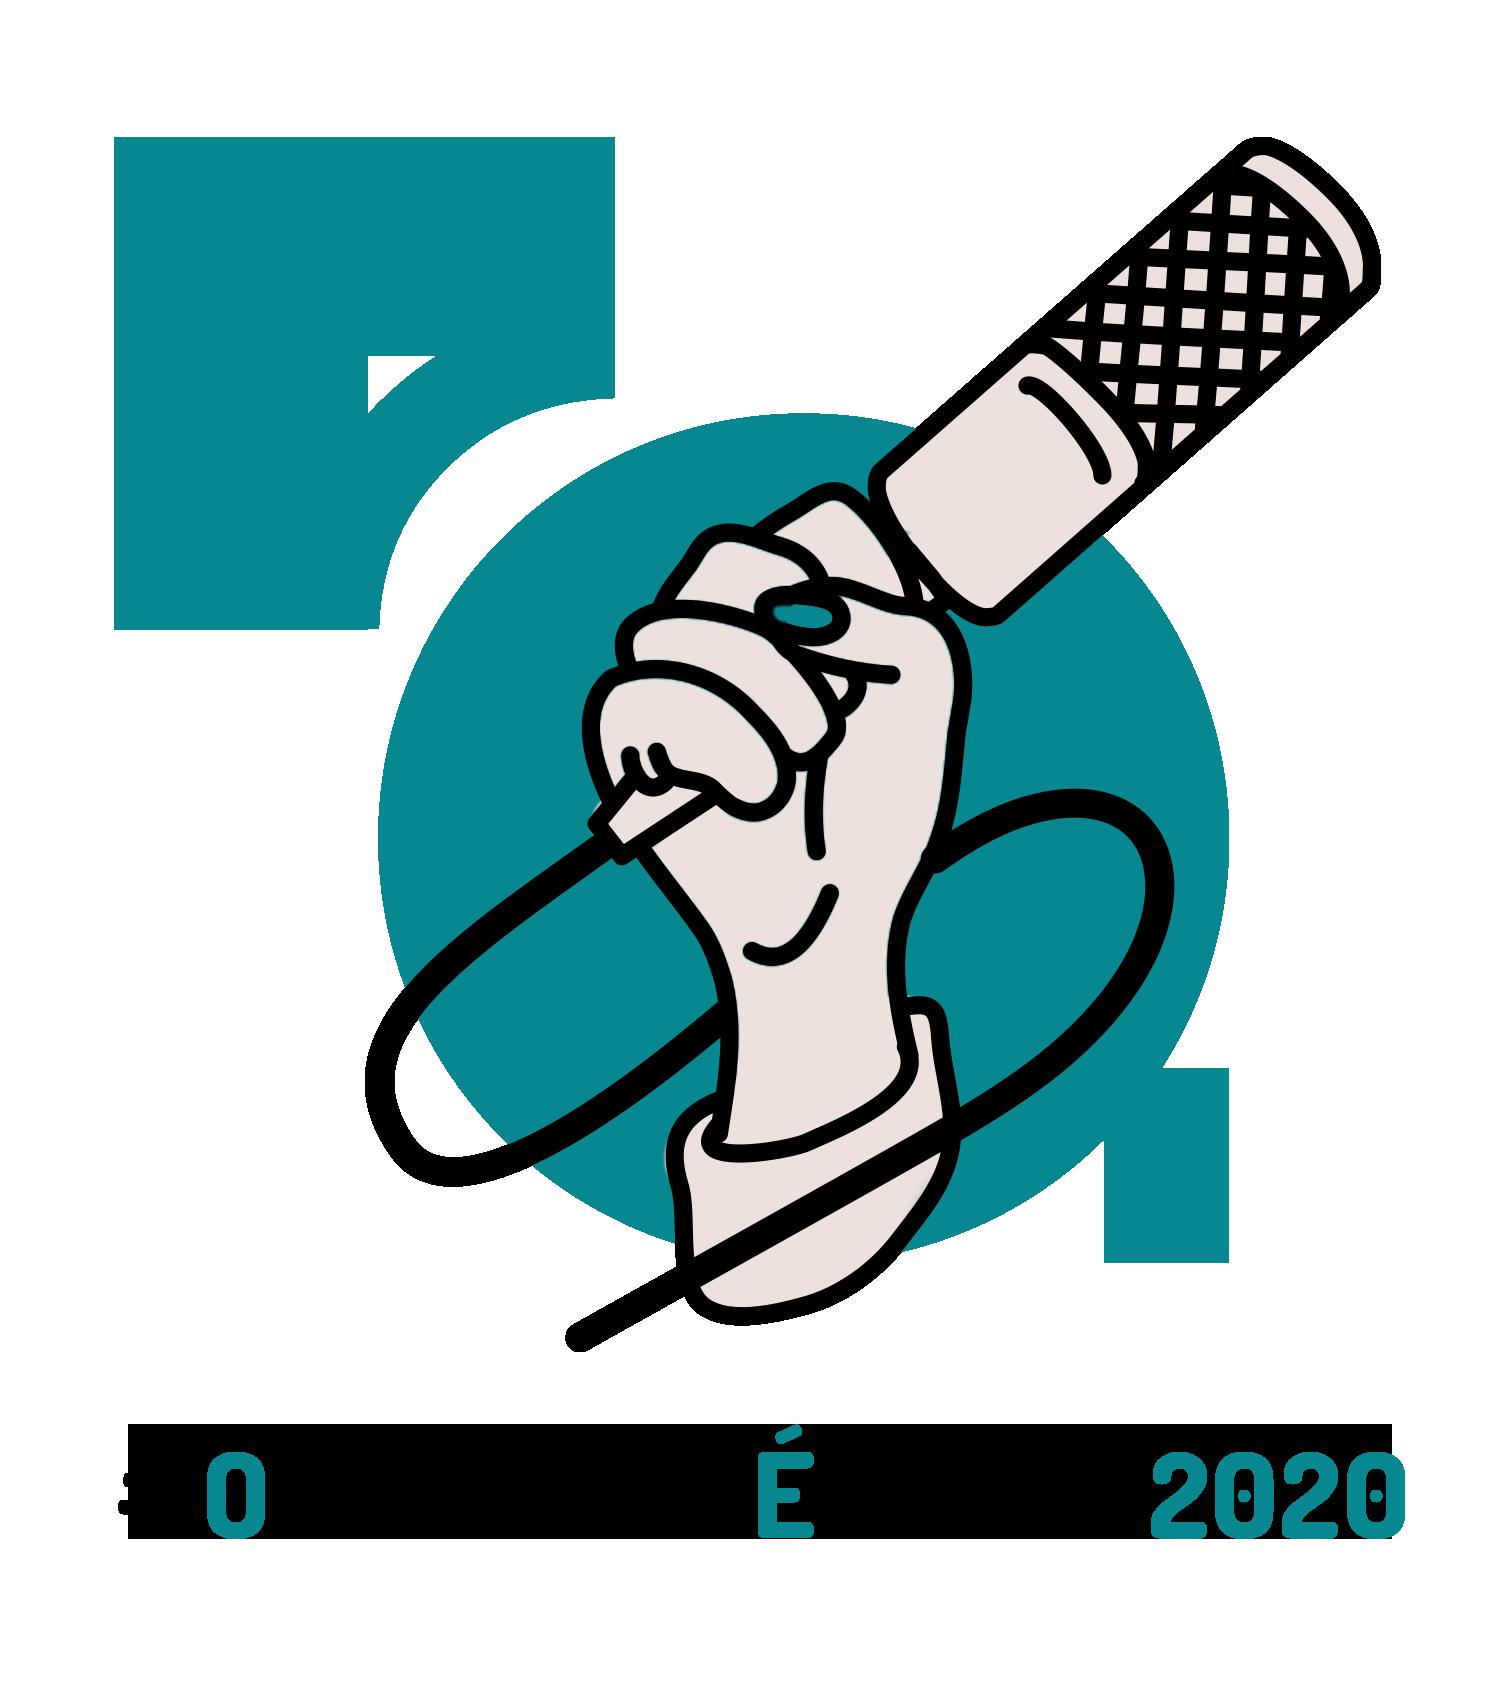 Logo #OPodcastÉDelas2020